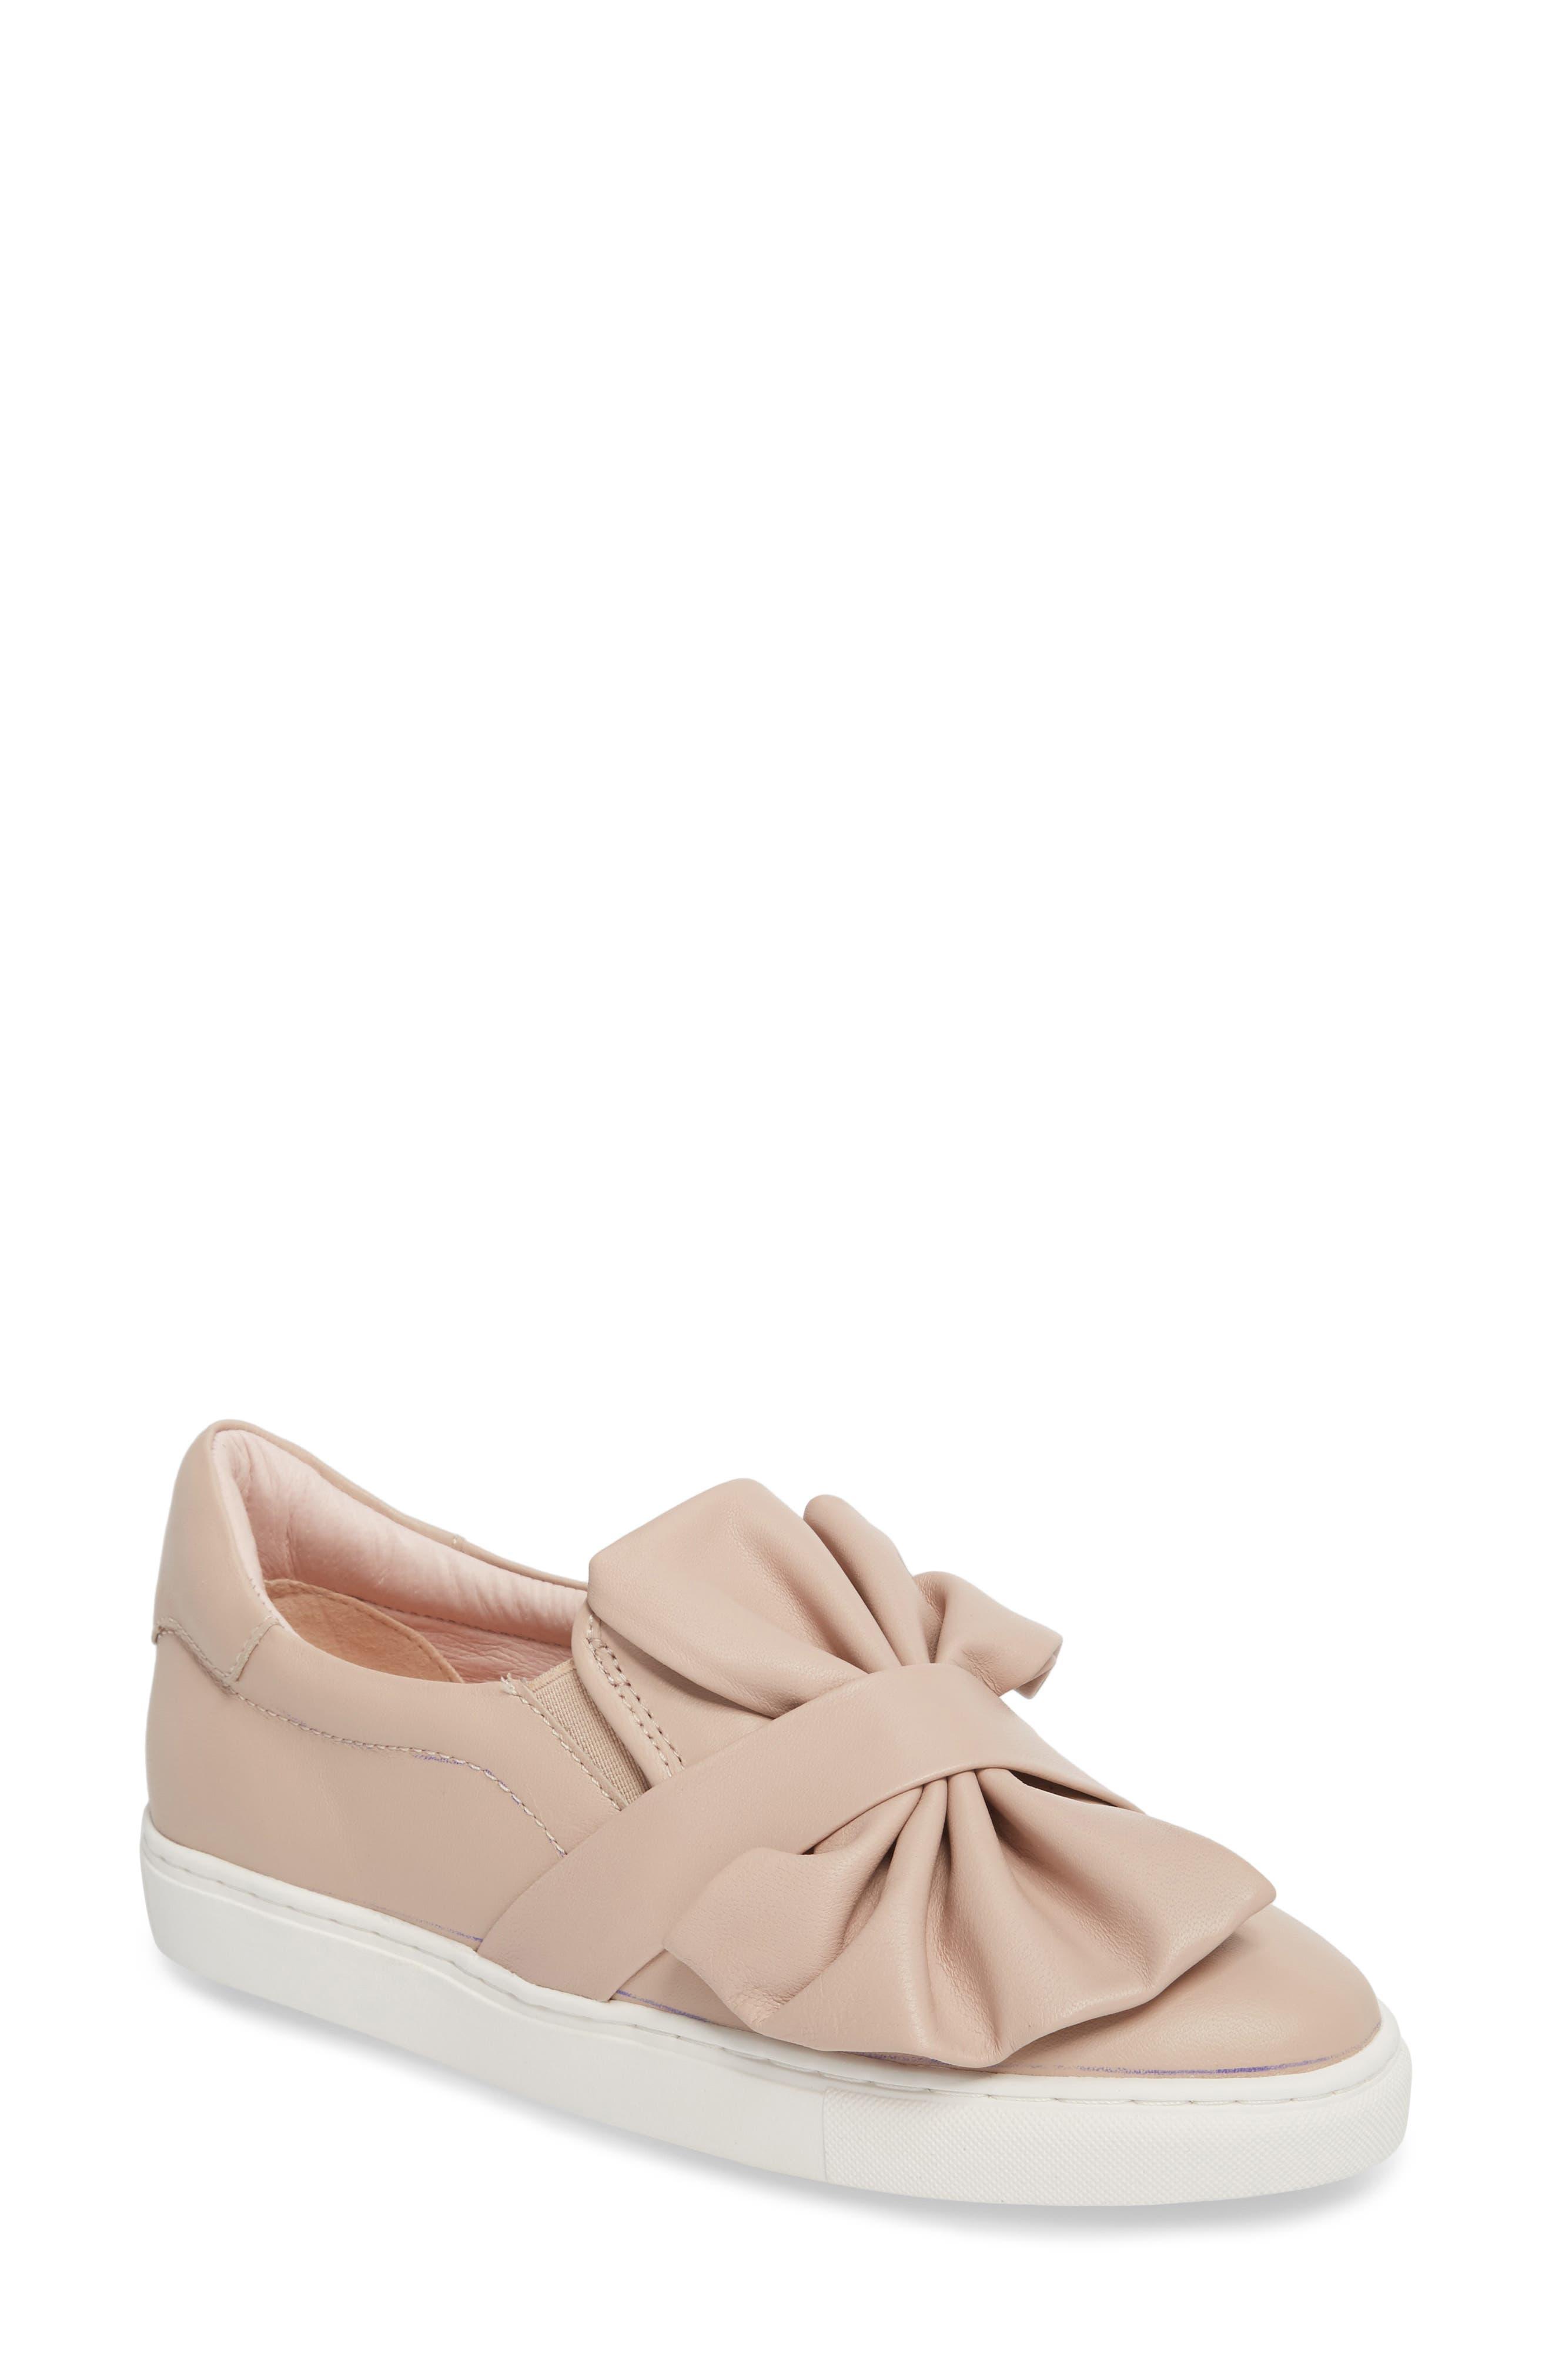 Main Image - Halogen® Mika Slip-On Sneaker (Women)